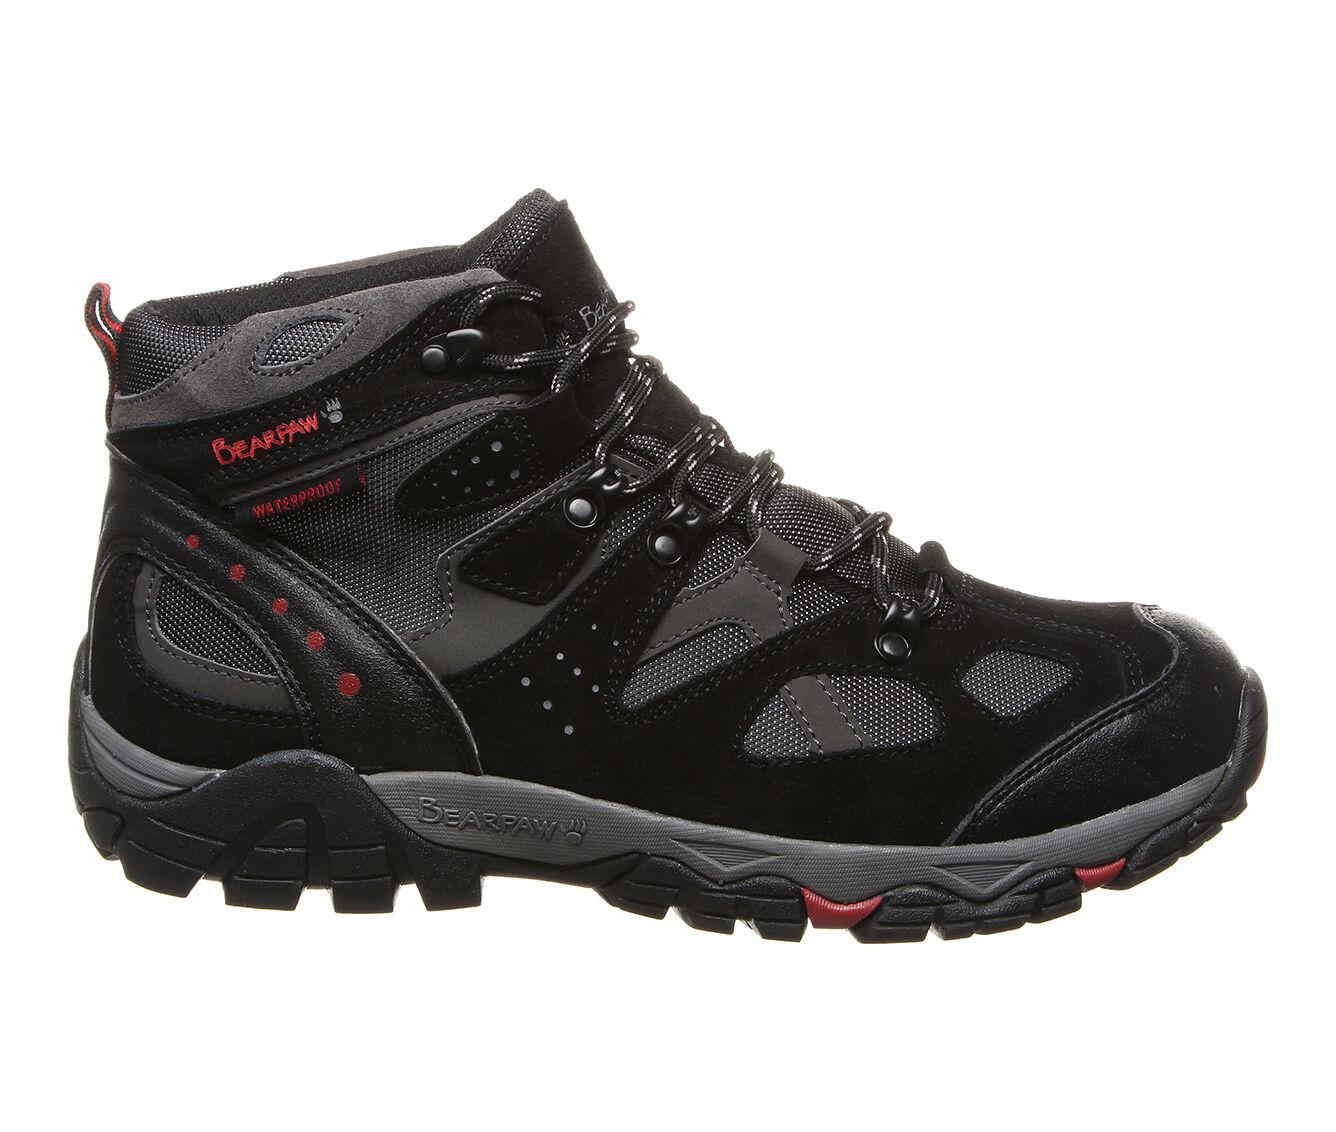 Wholesale Men's Bearpaw Brock Hiking Boots Black/Grey